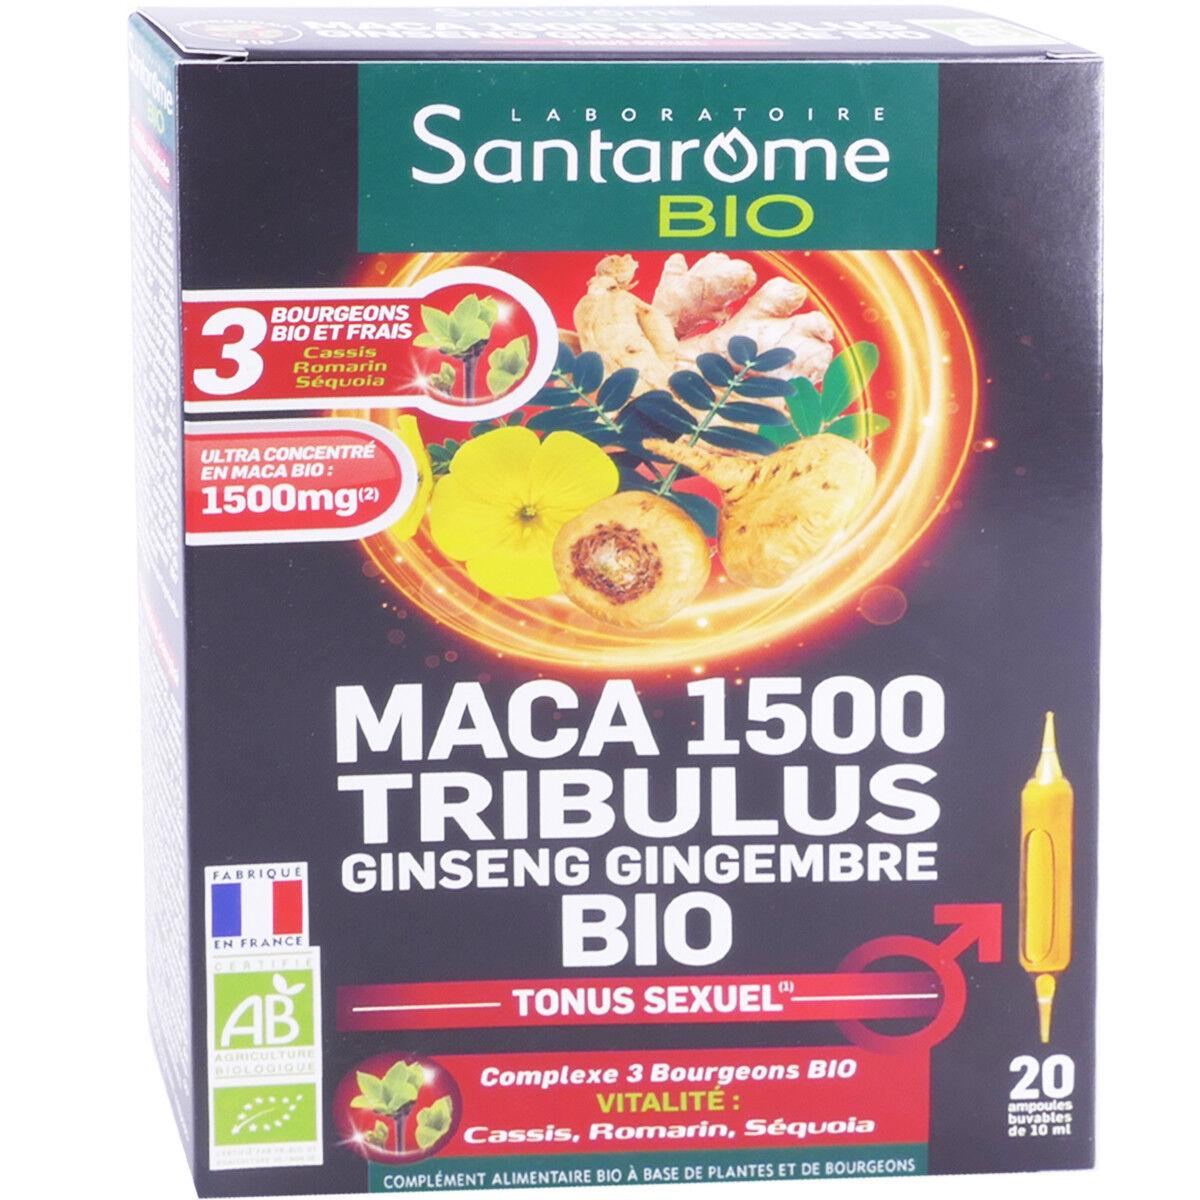 Santarome bio maca 1500 tribulus 20 ampoules 10ml